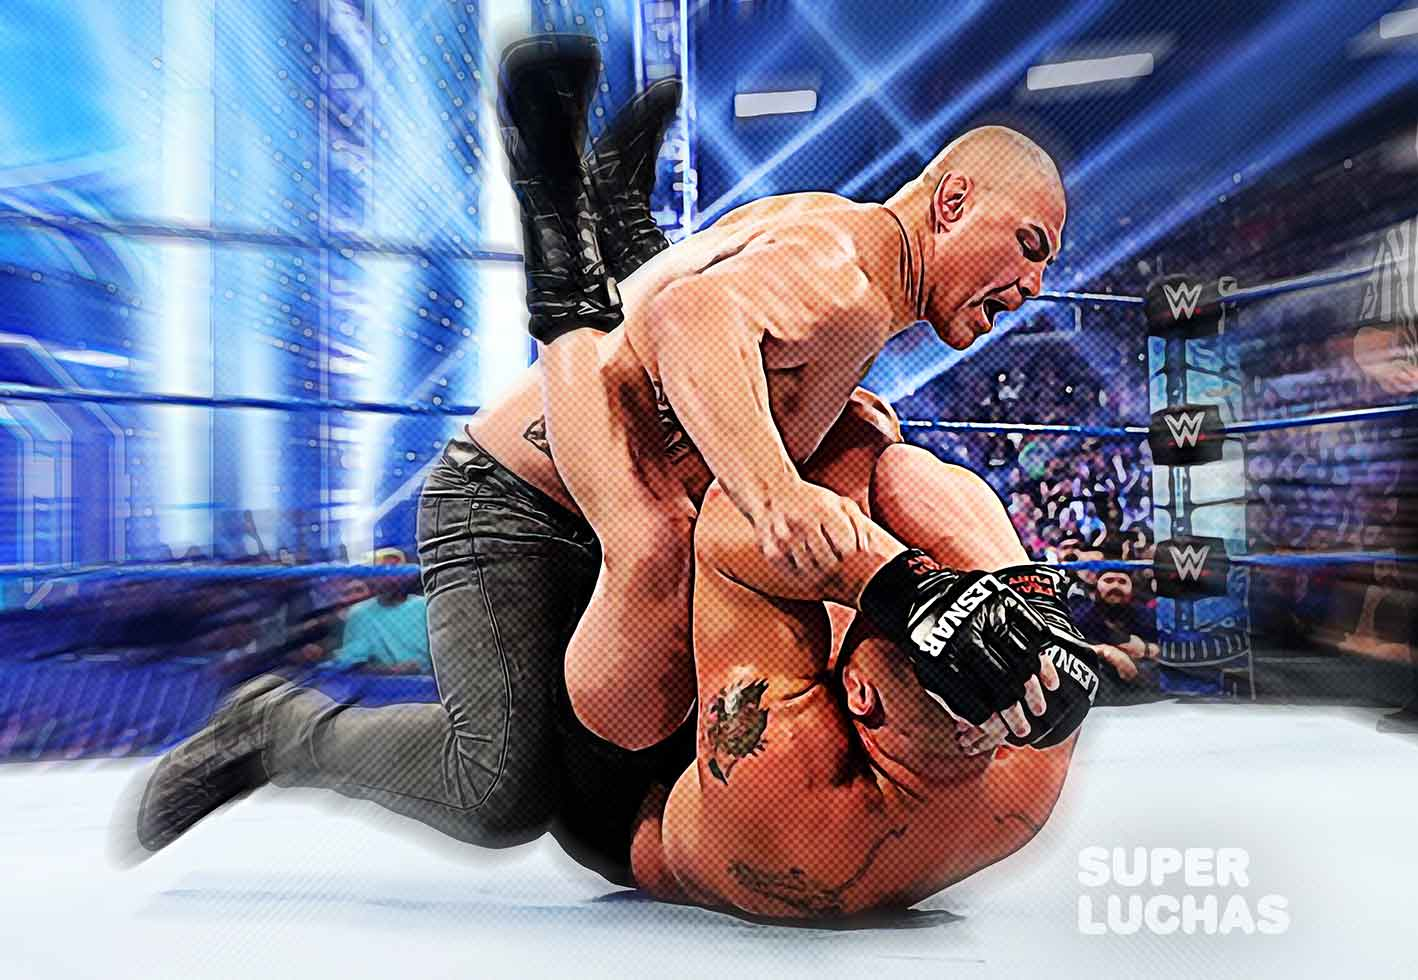 Cain Velasquez vs. Brock Lesnar